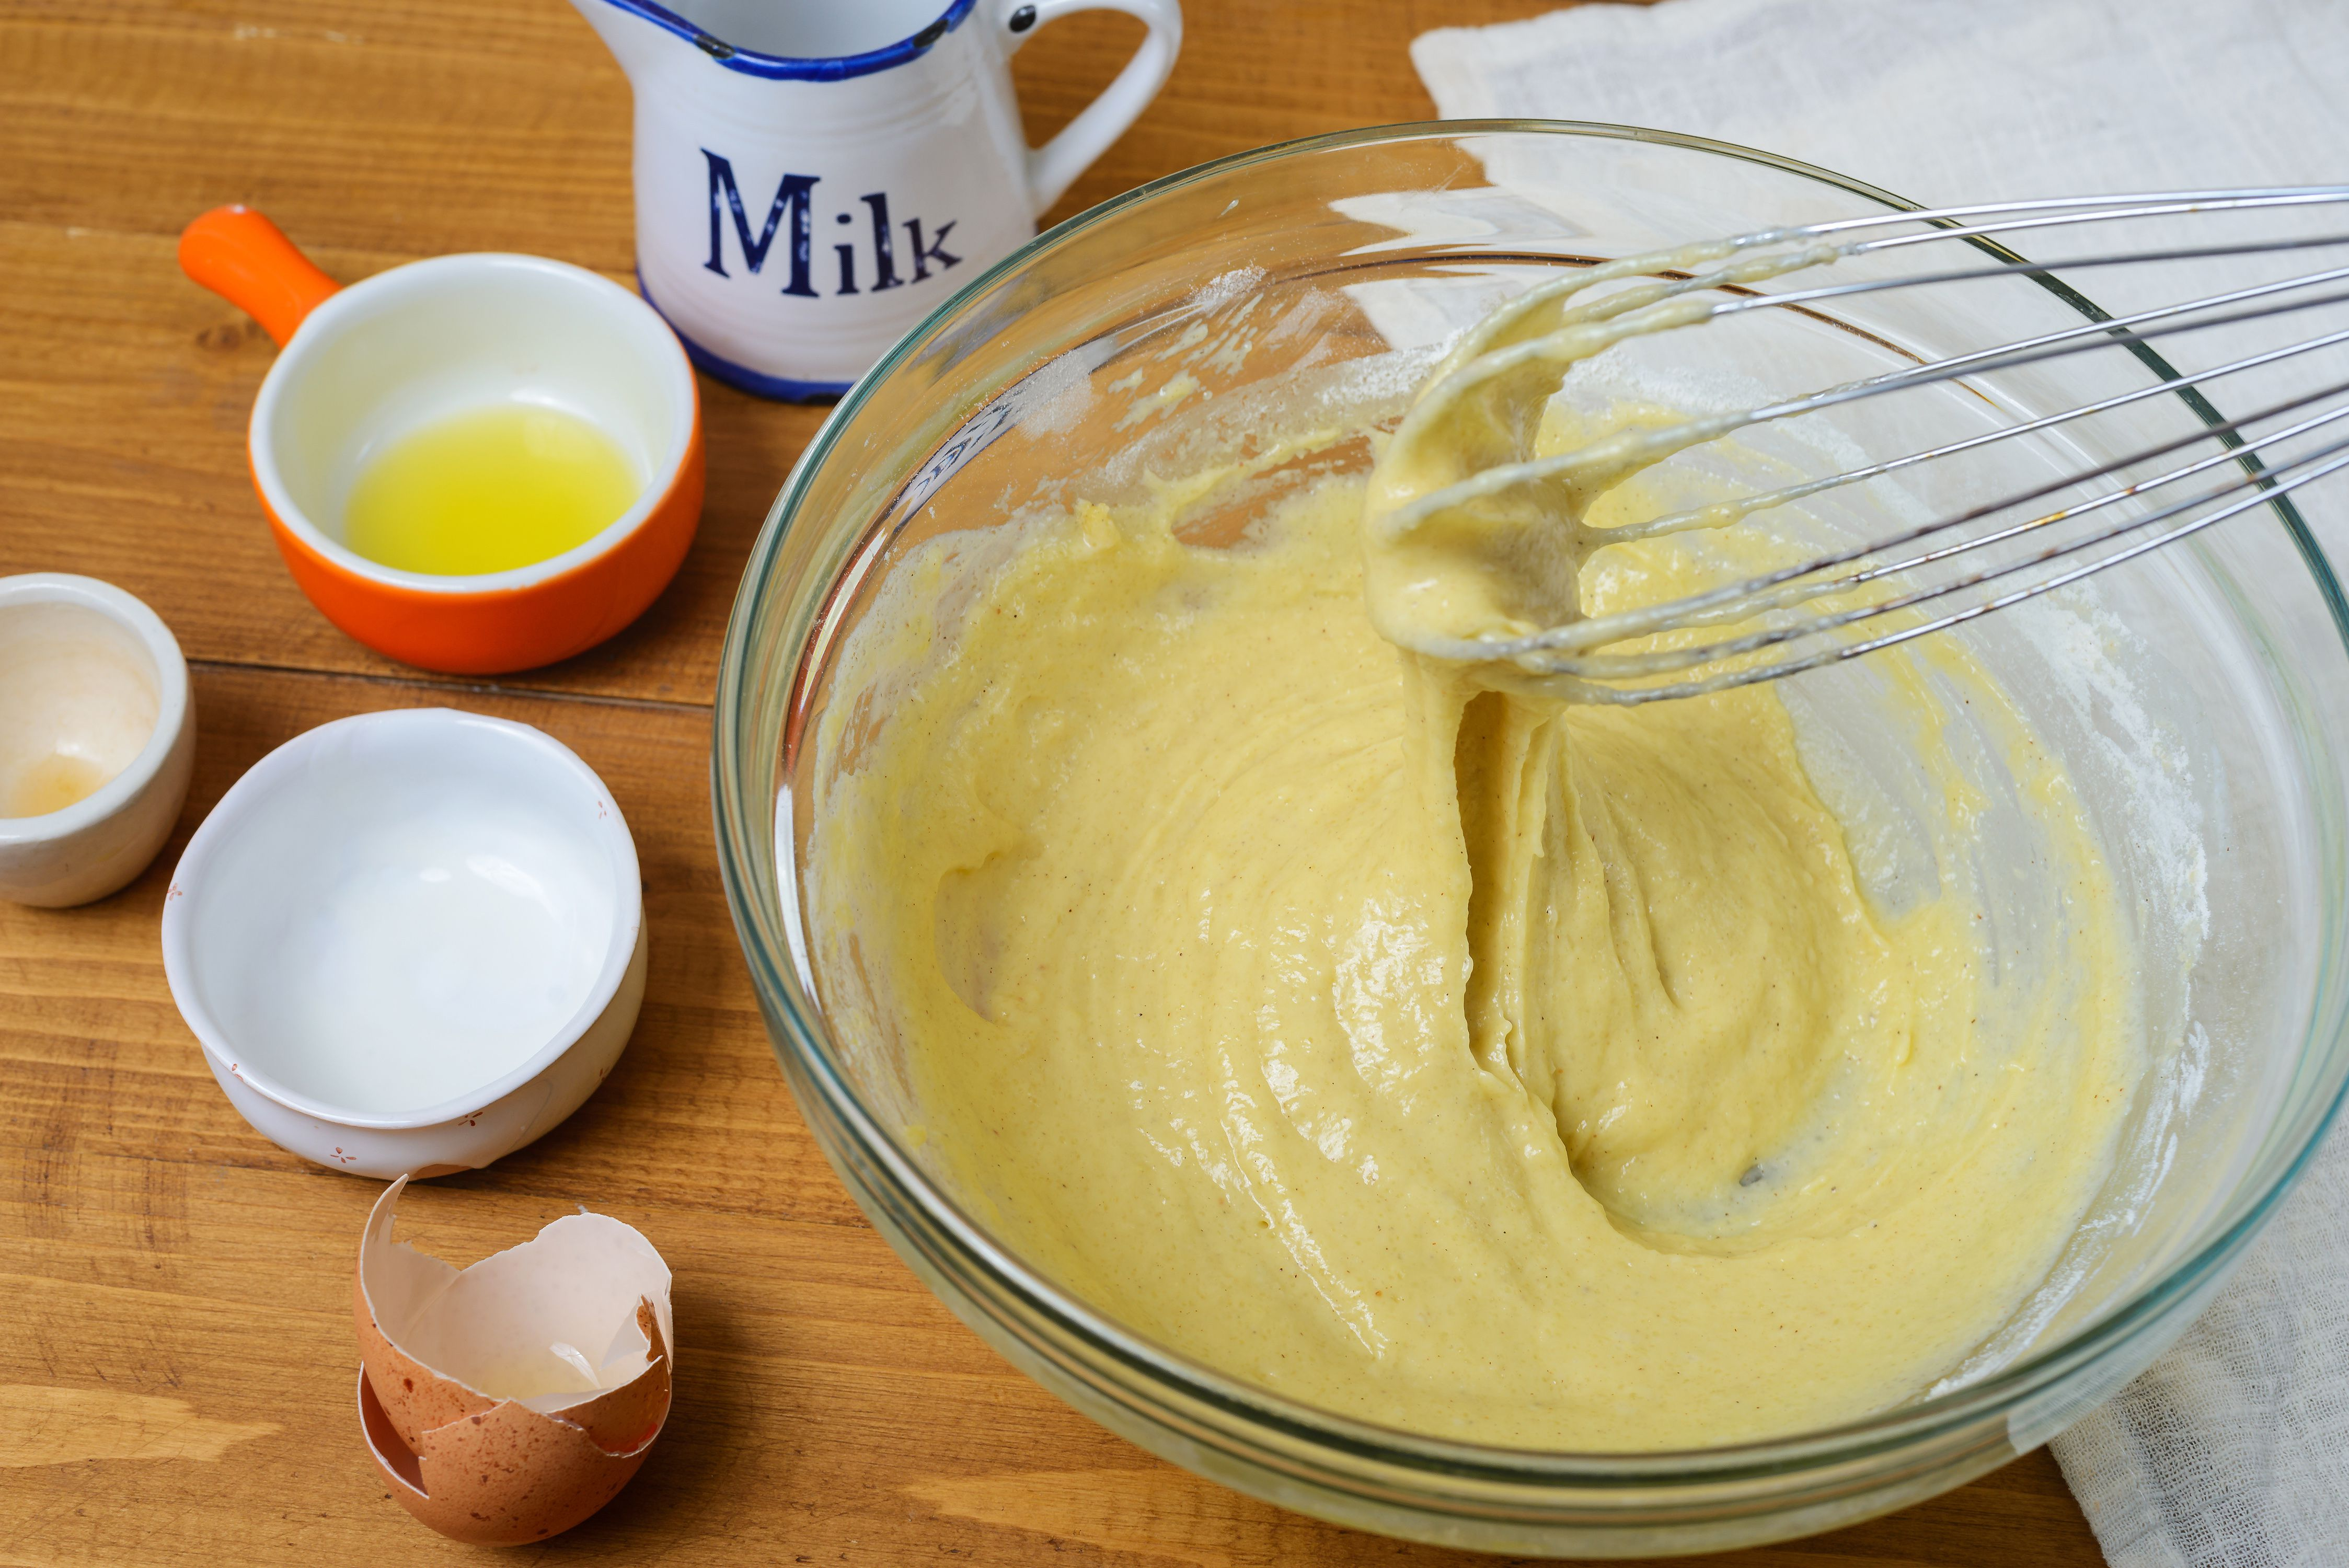 Add milk and olive oil